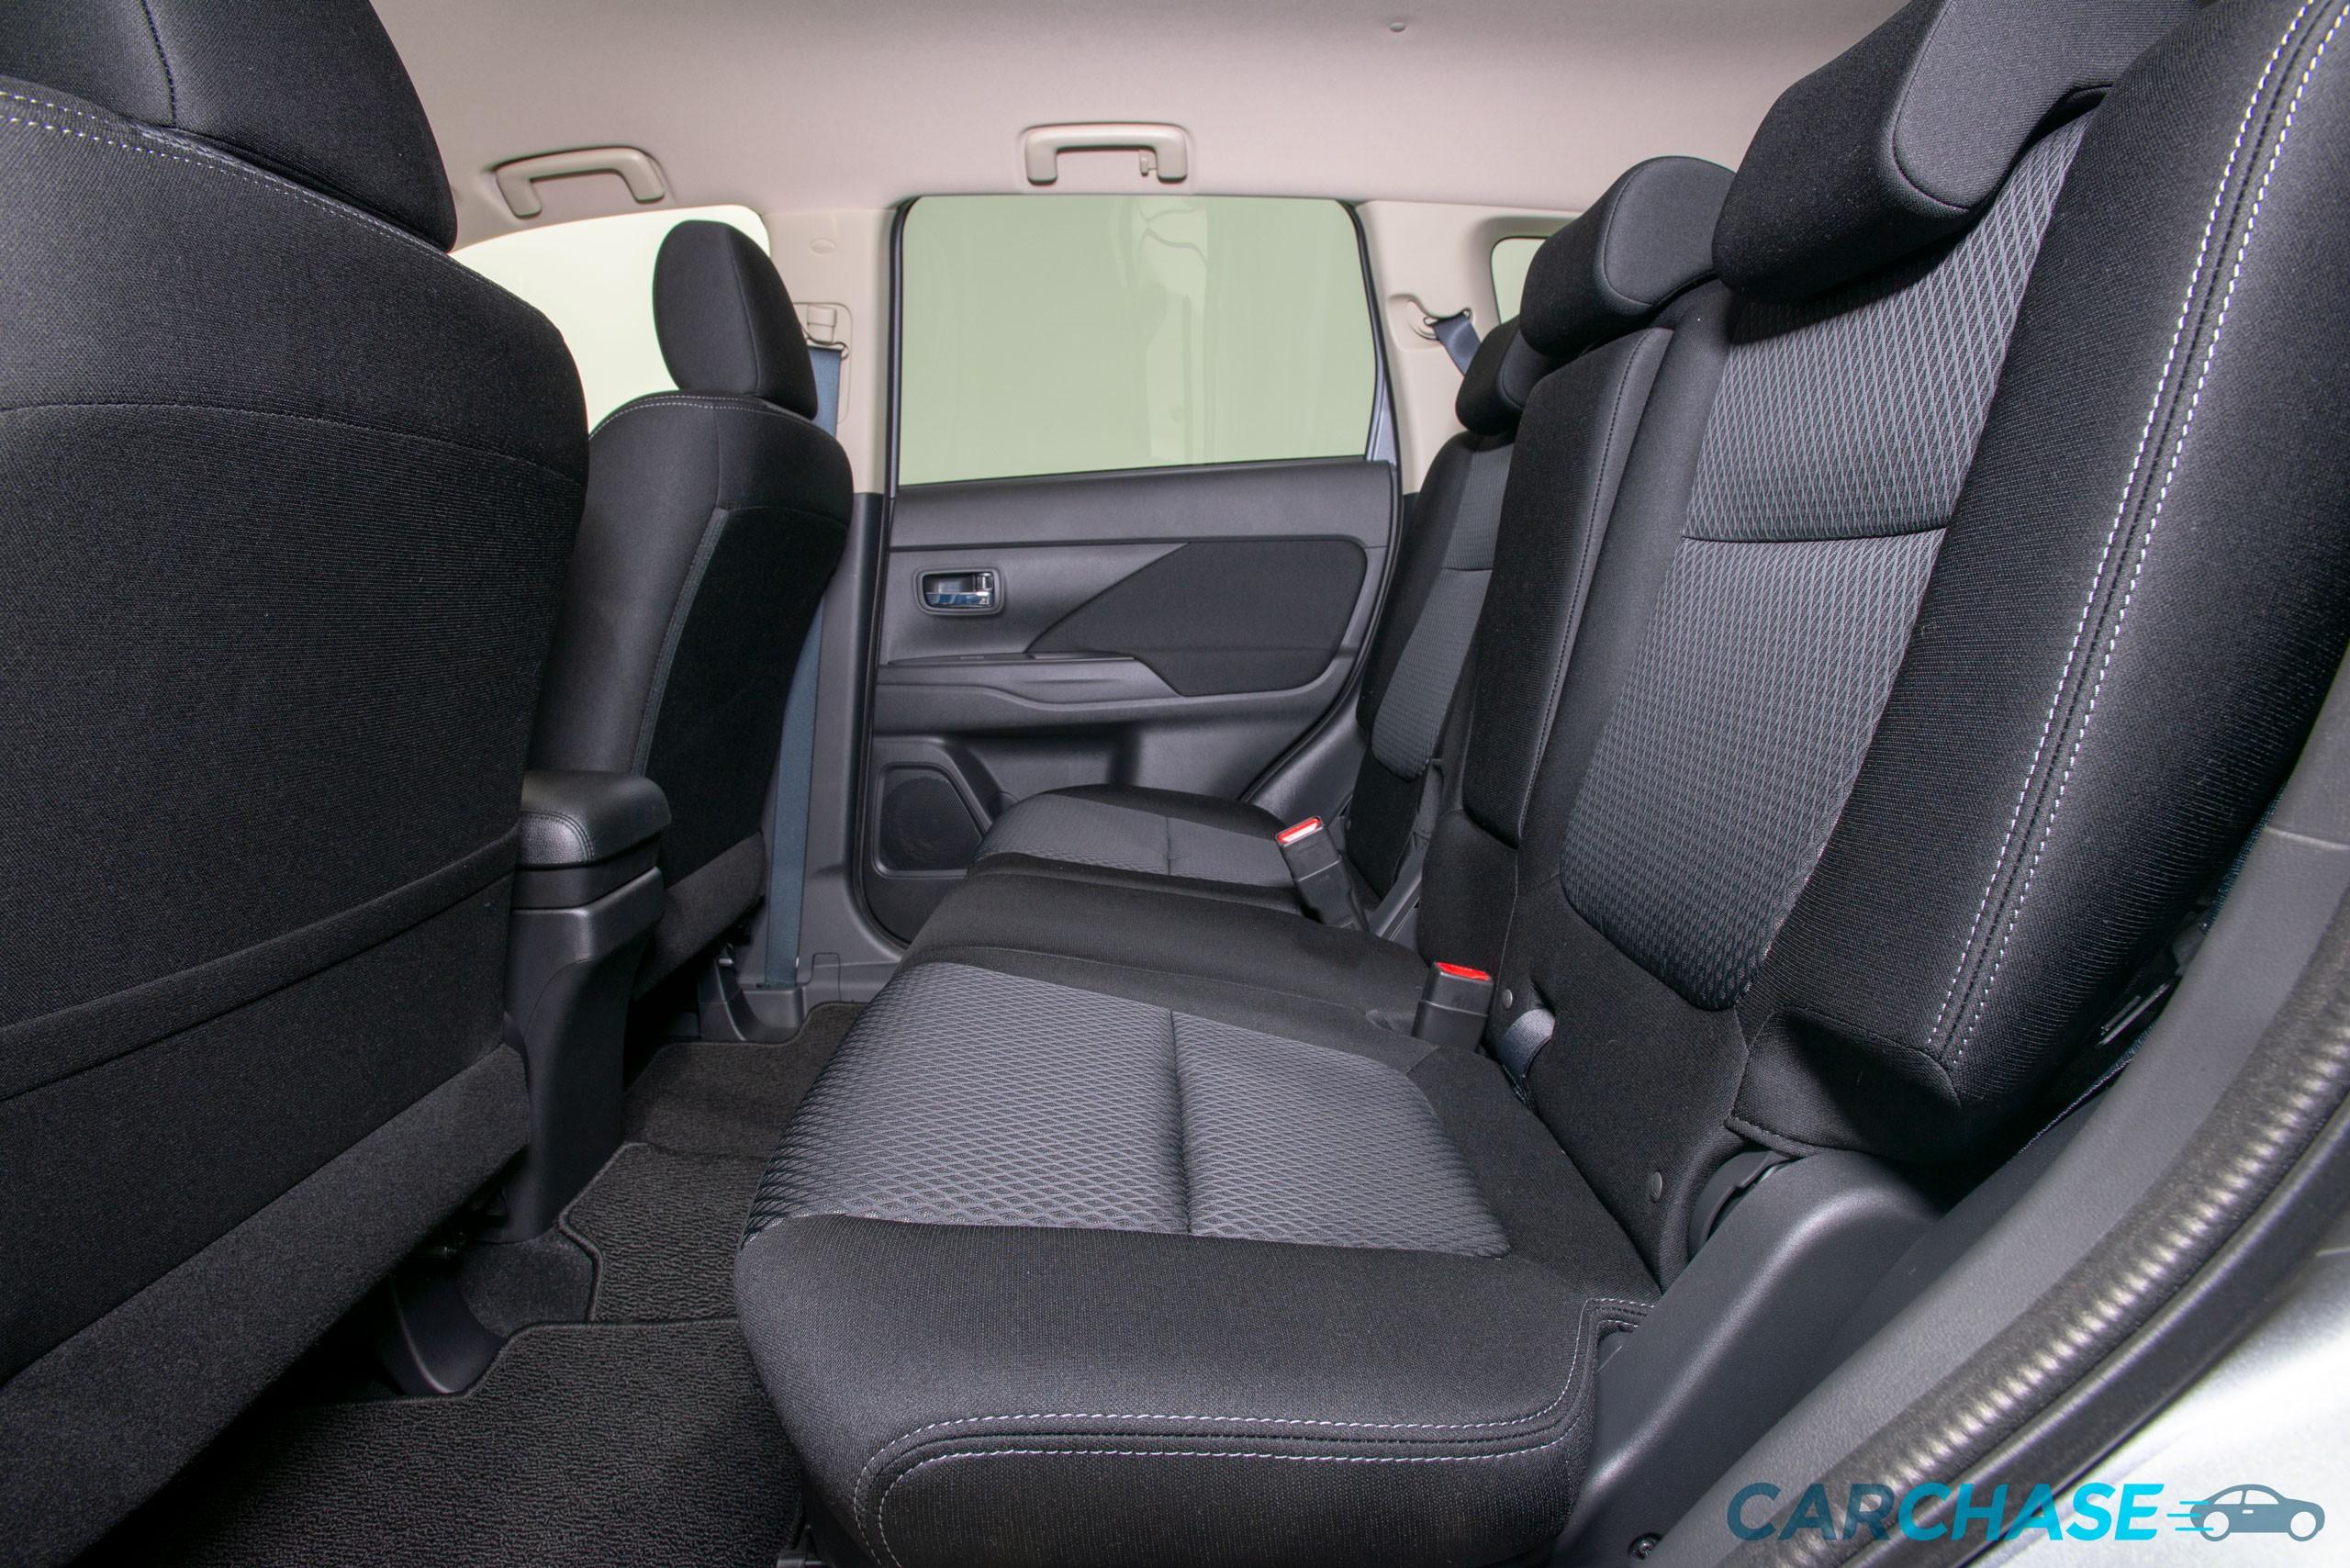 Image 10/10 of 2018 Mitsubishi Outlander LS ZL